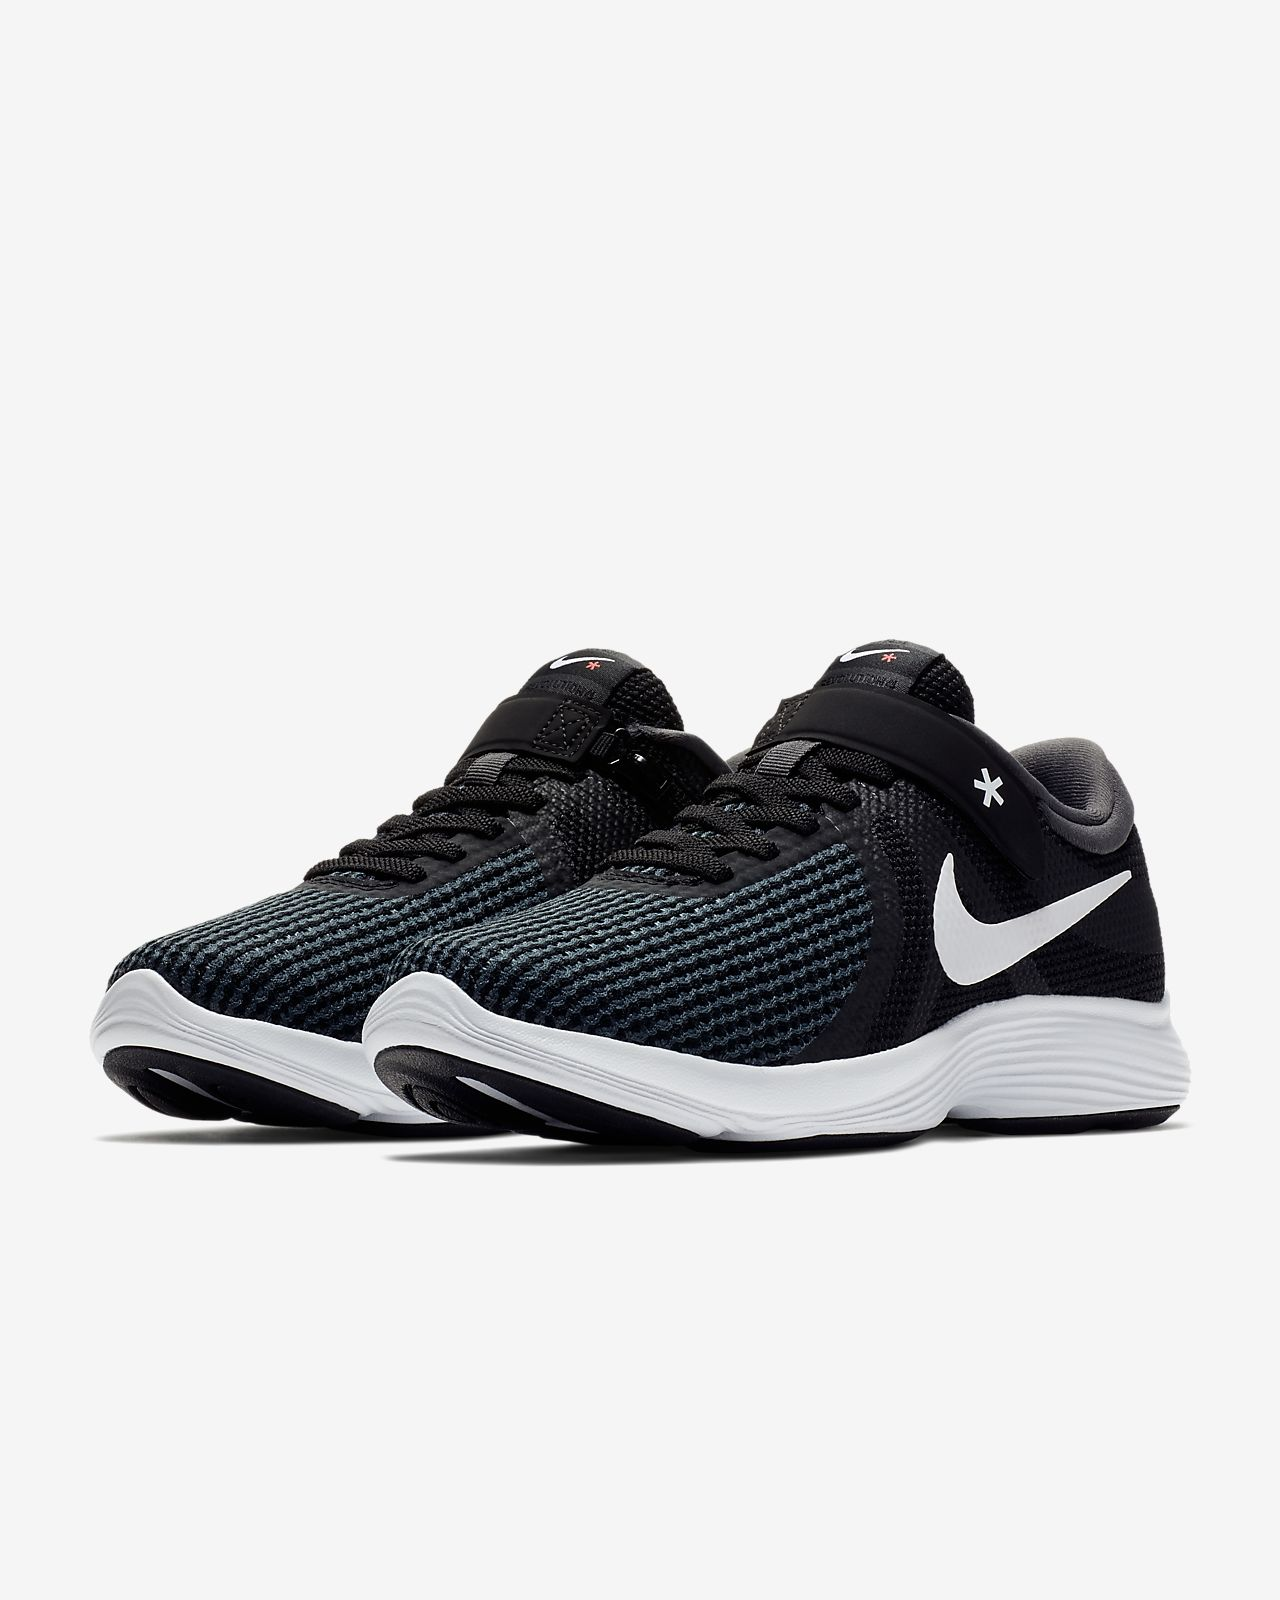 a39ac7a780a9 Nike Revolution 4 FlyEase Women s Running Shoe. Nike.com